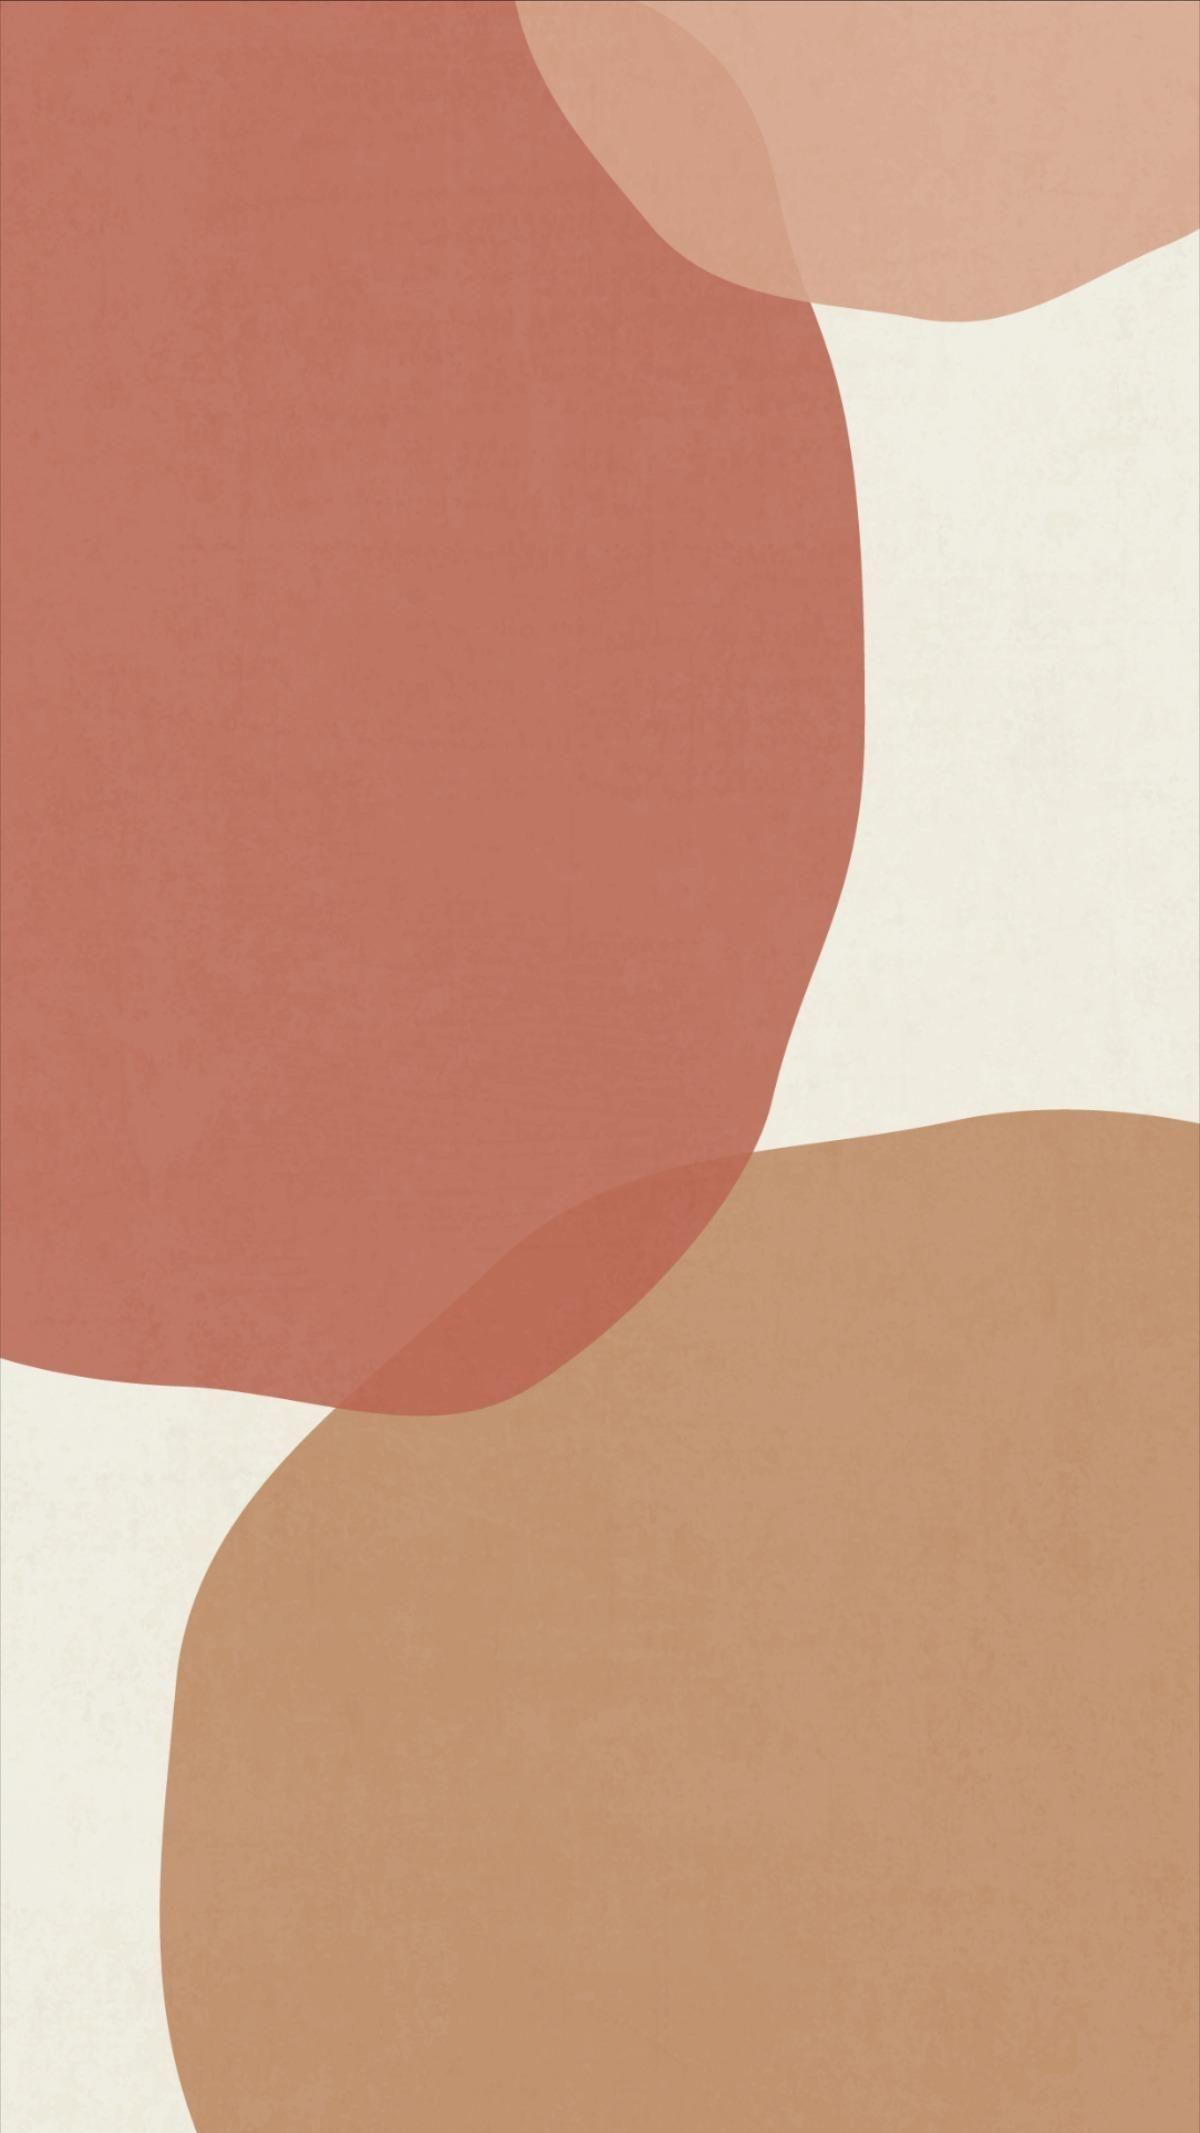 Abstract Boho Phone Wallpapers | Earthy Tones